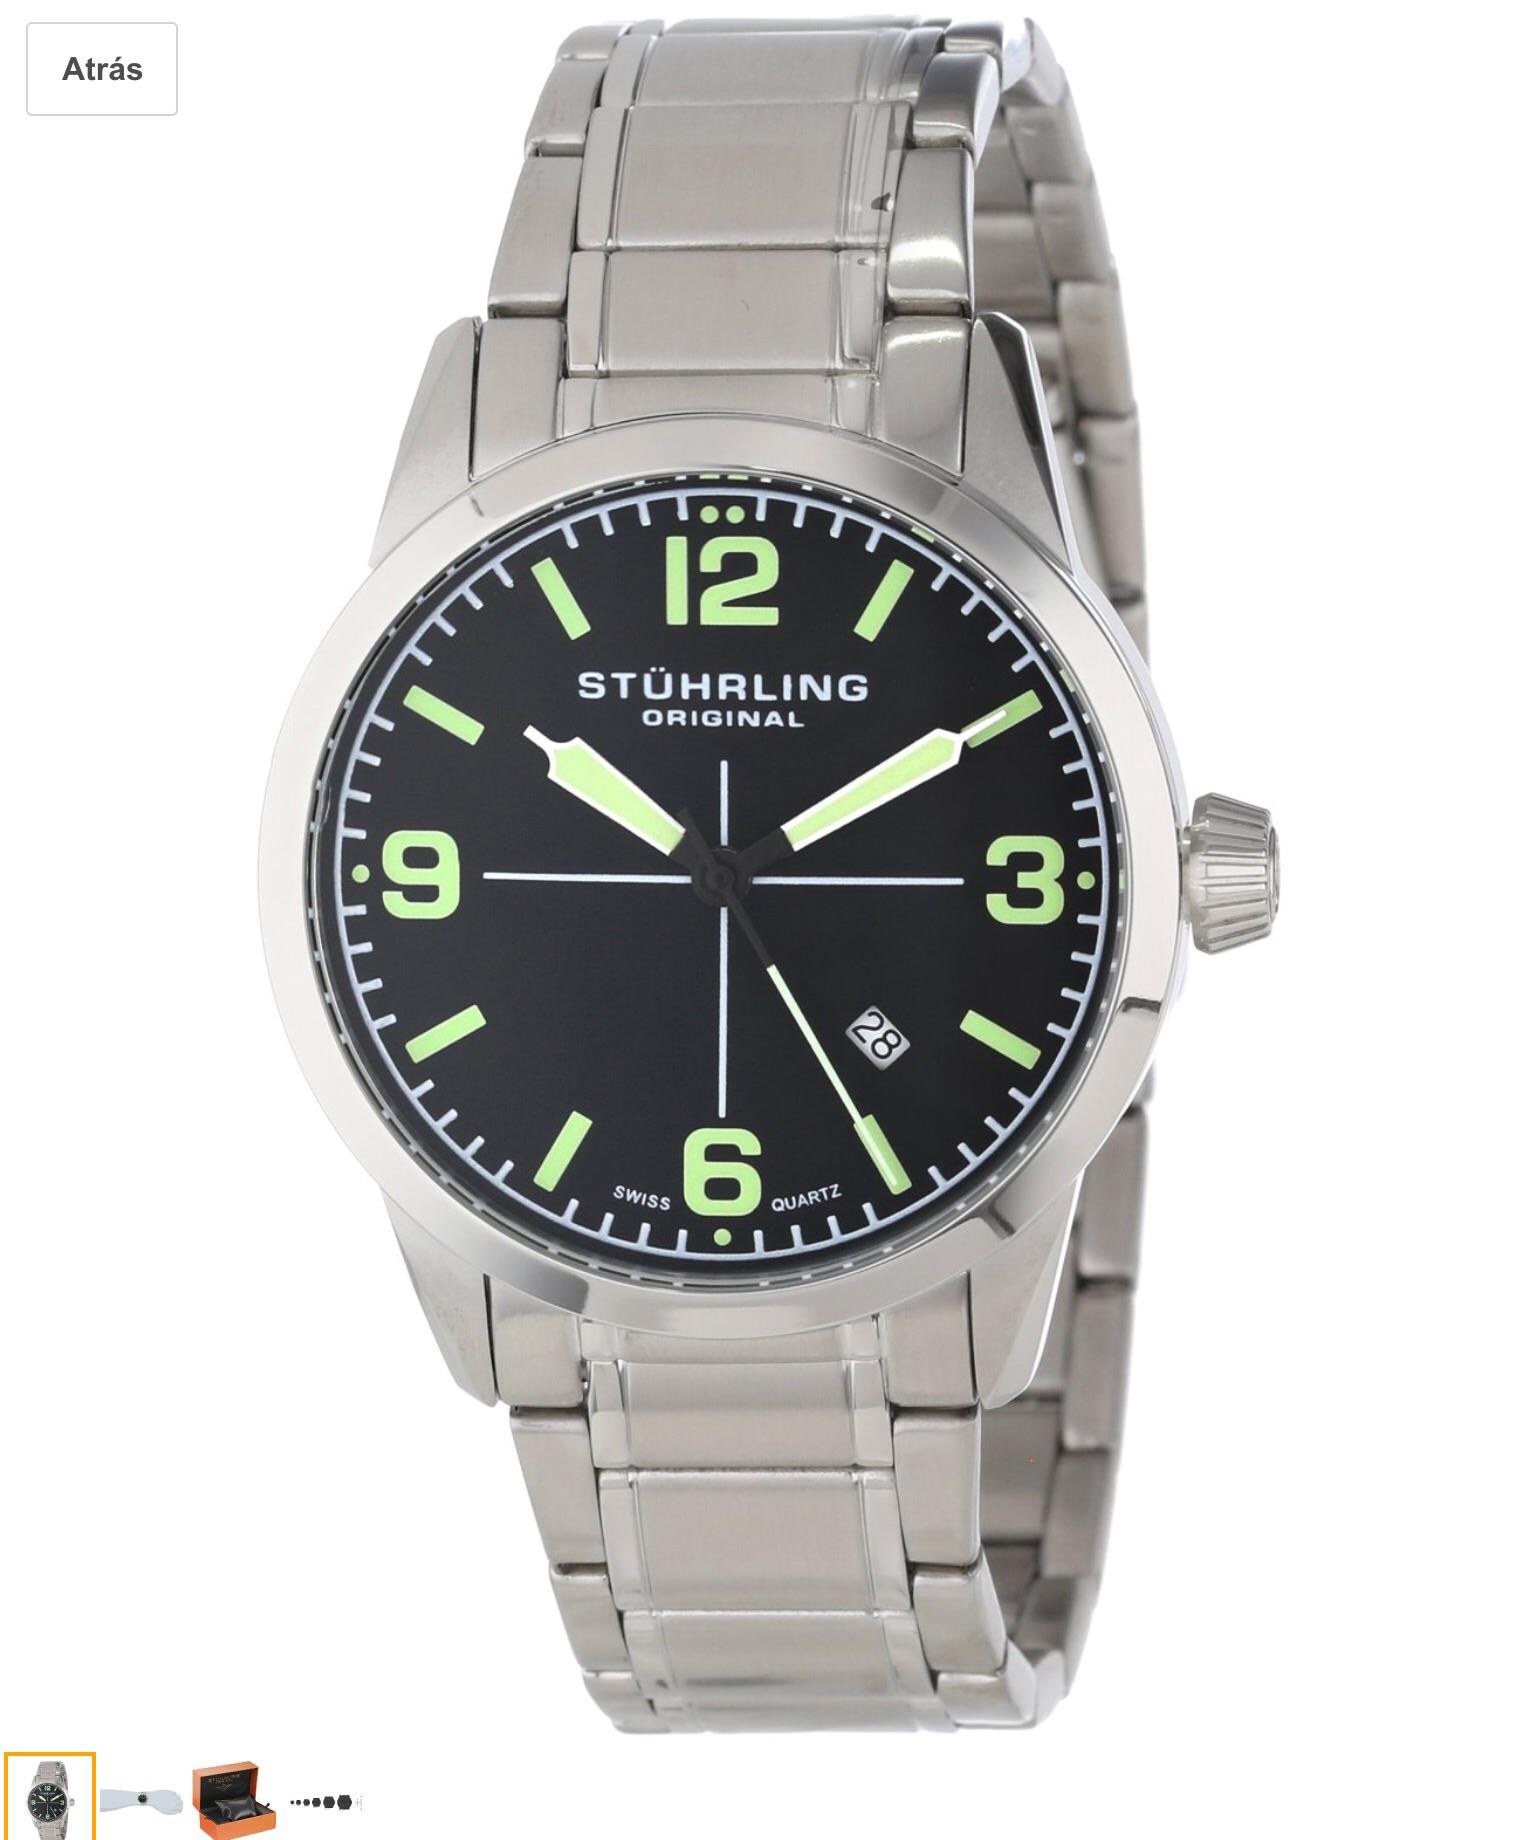 Amazon Mx: Stuhrling Original 449B.331171 Aviator Tuskegee Elite Reloj de cuarzo suizo, en acero inoxidable y con fecha